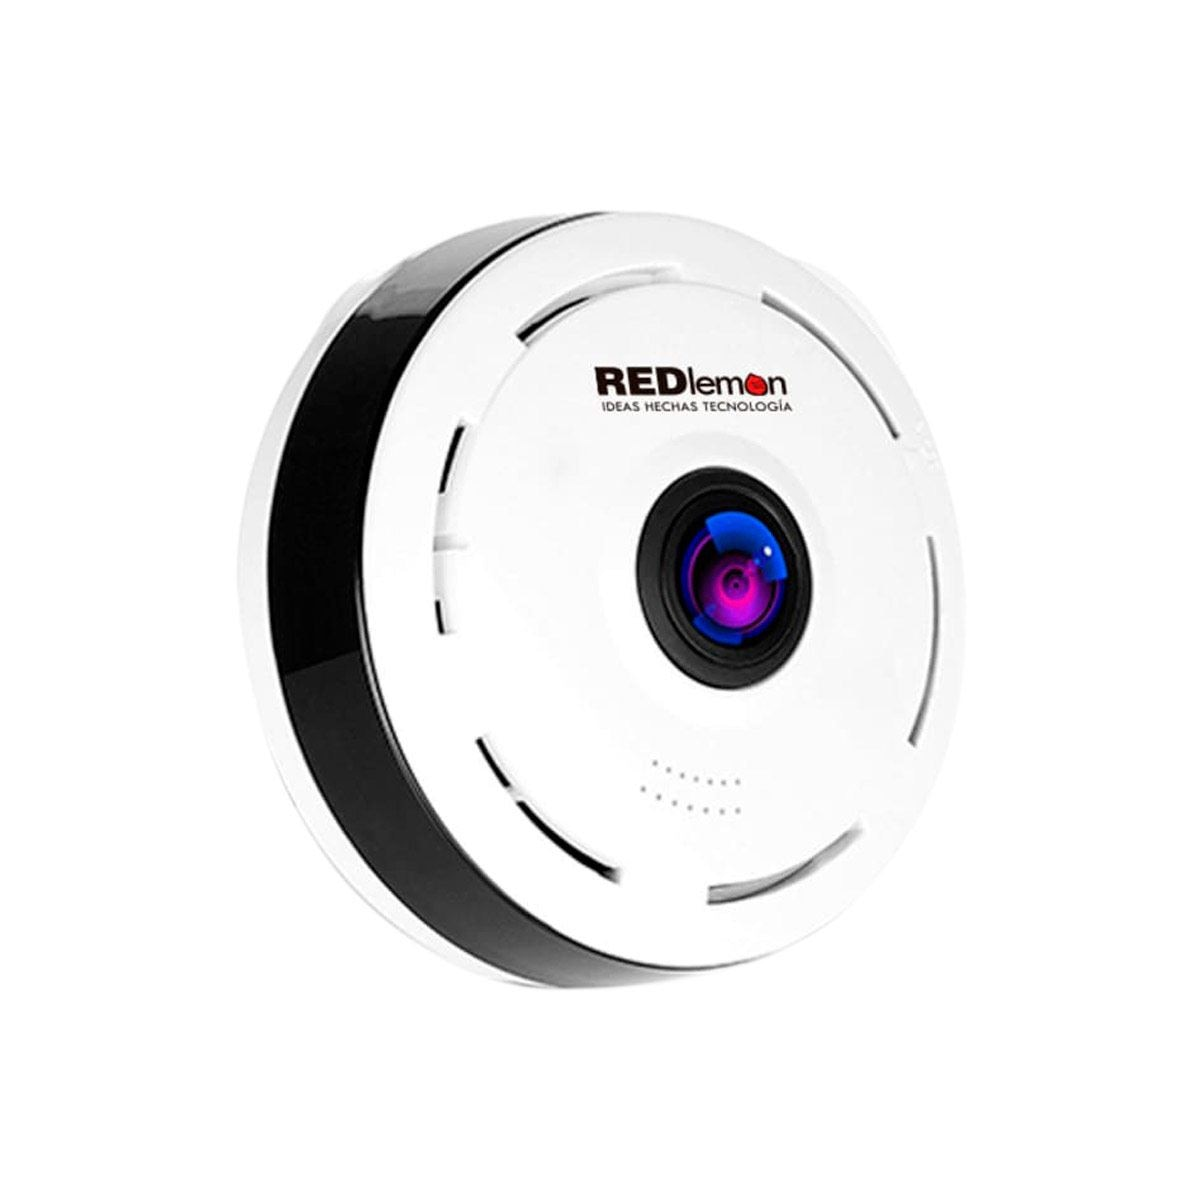 Cámara de Seguridad RedLemon WiFi 360° Grados Blanca